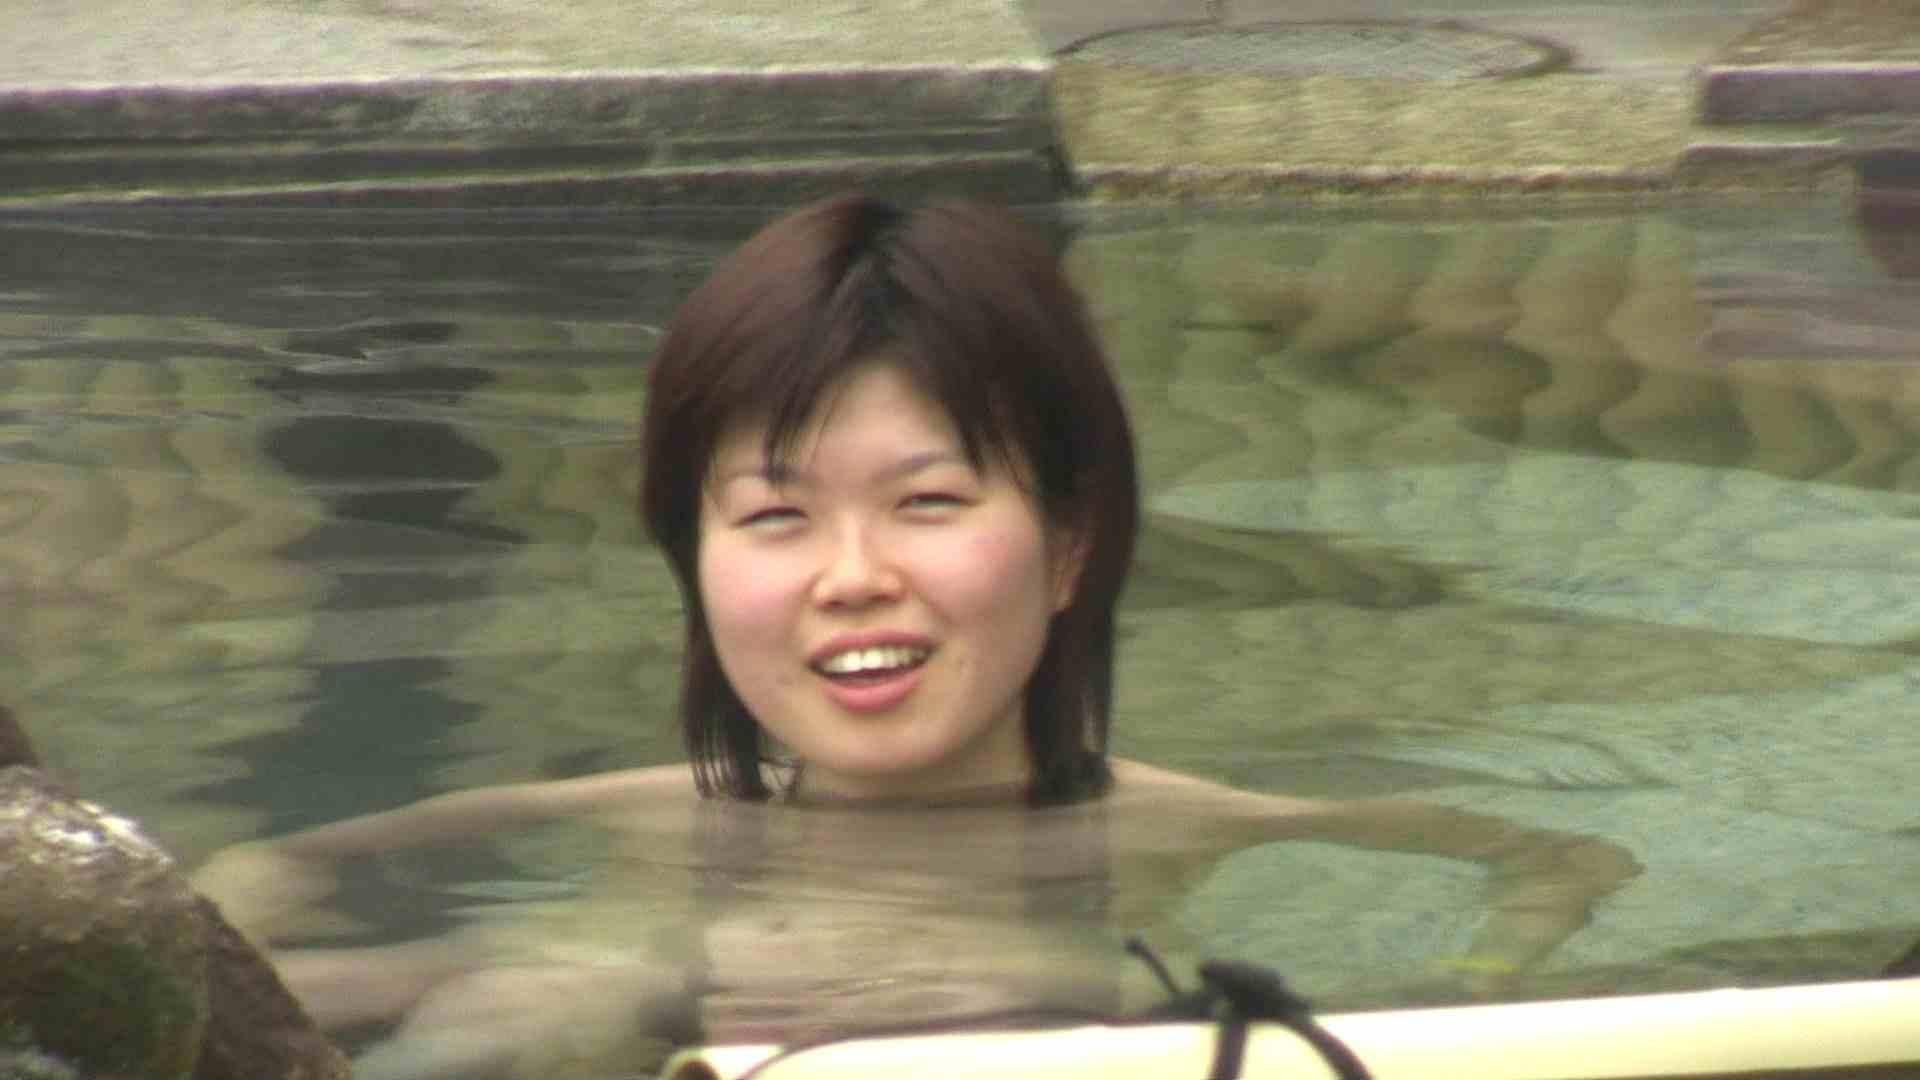 Aquaな露天風呂Vol.675 HなOL   露天  88pic 24